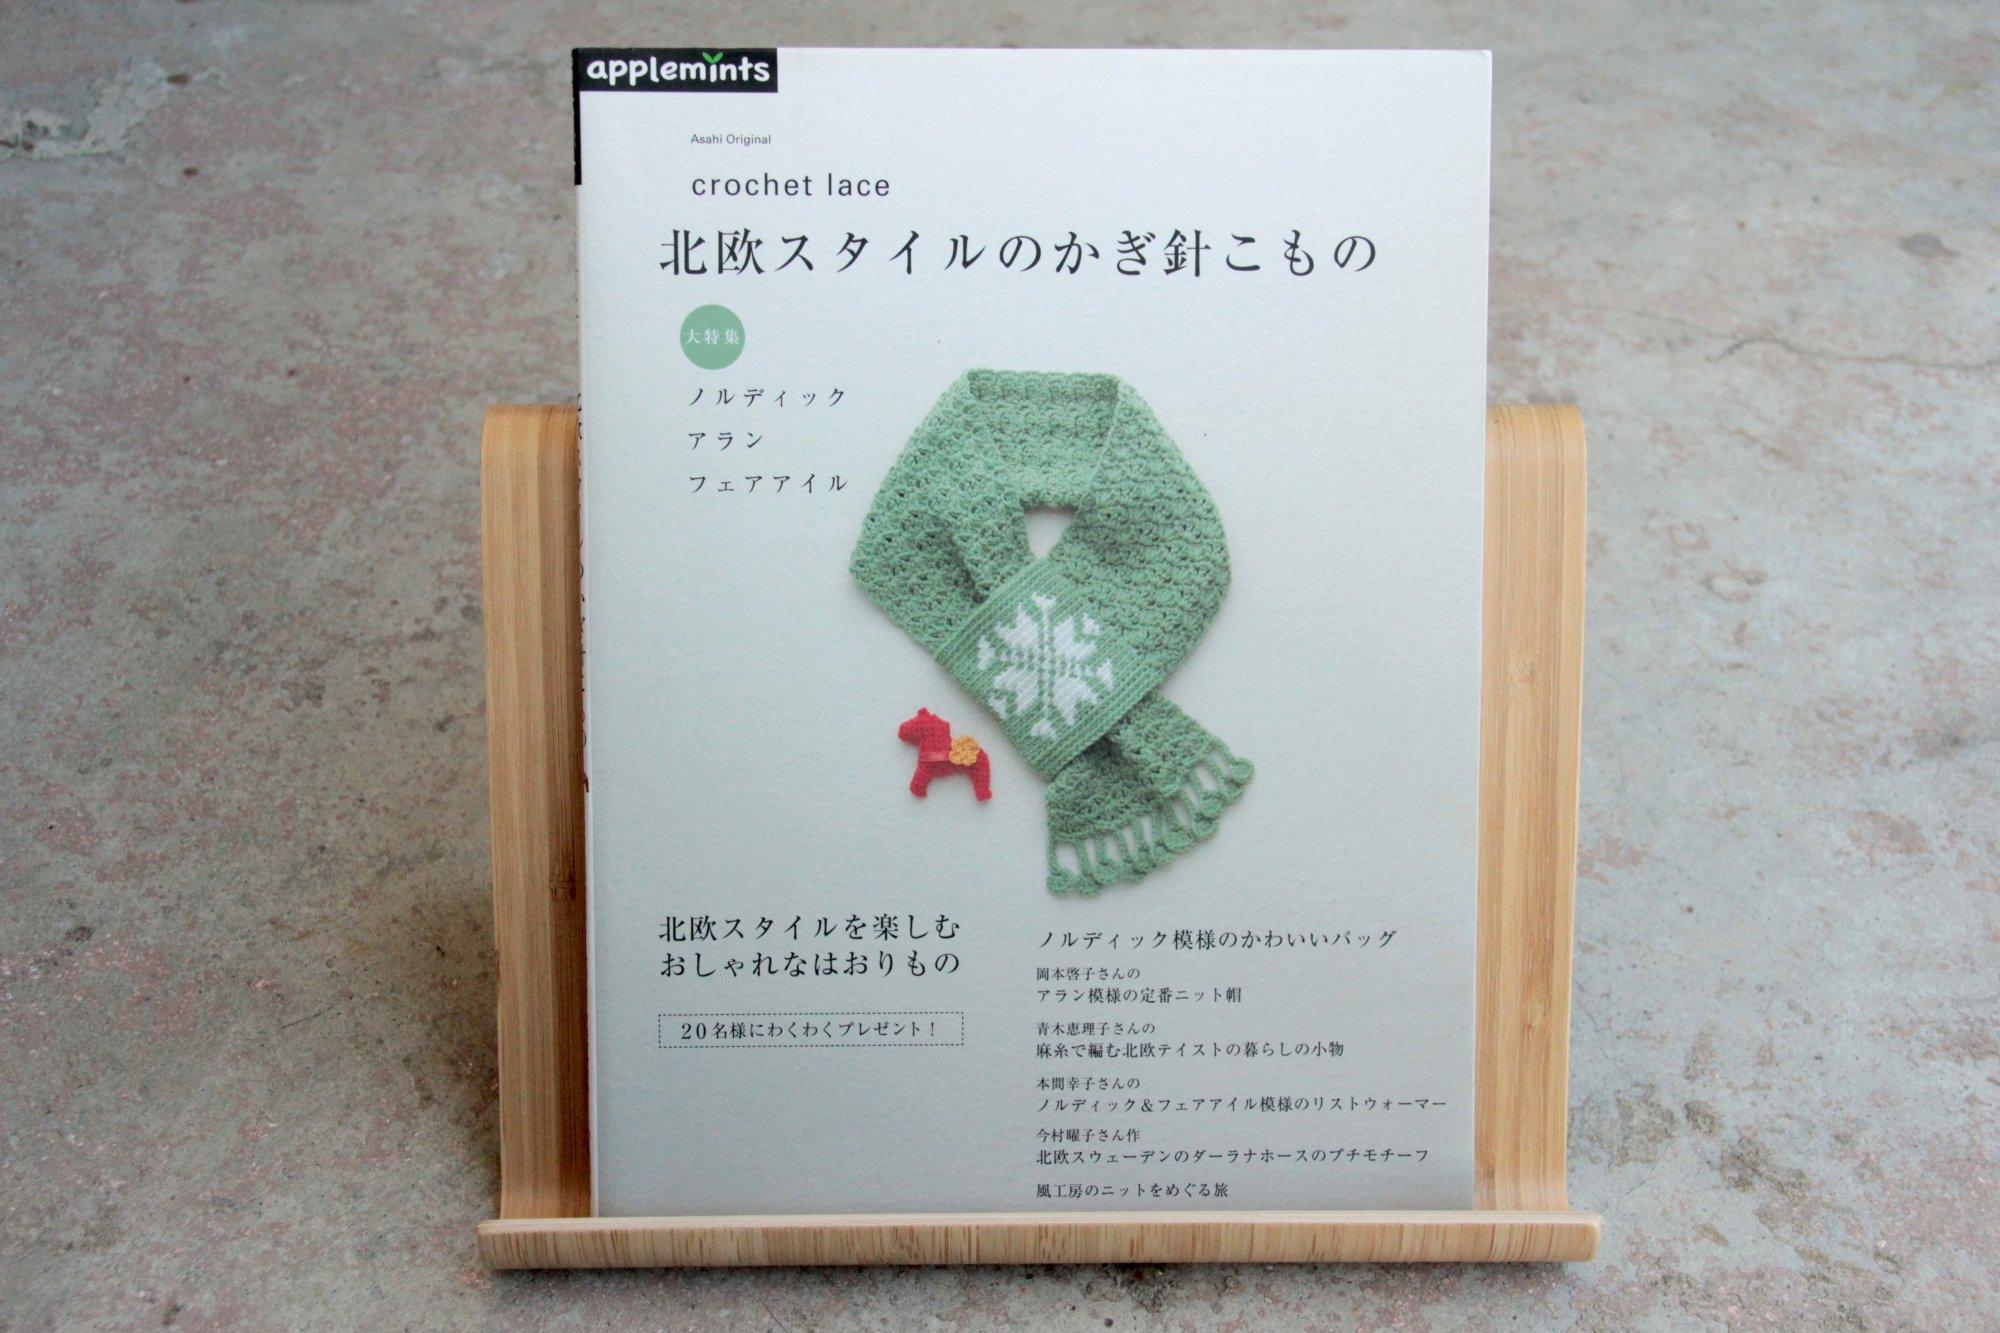 Crochet Lace (Asahi original, Japanese)